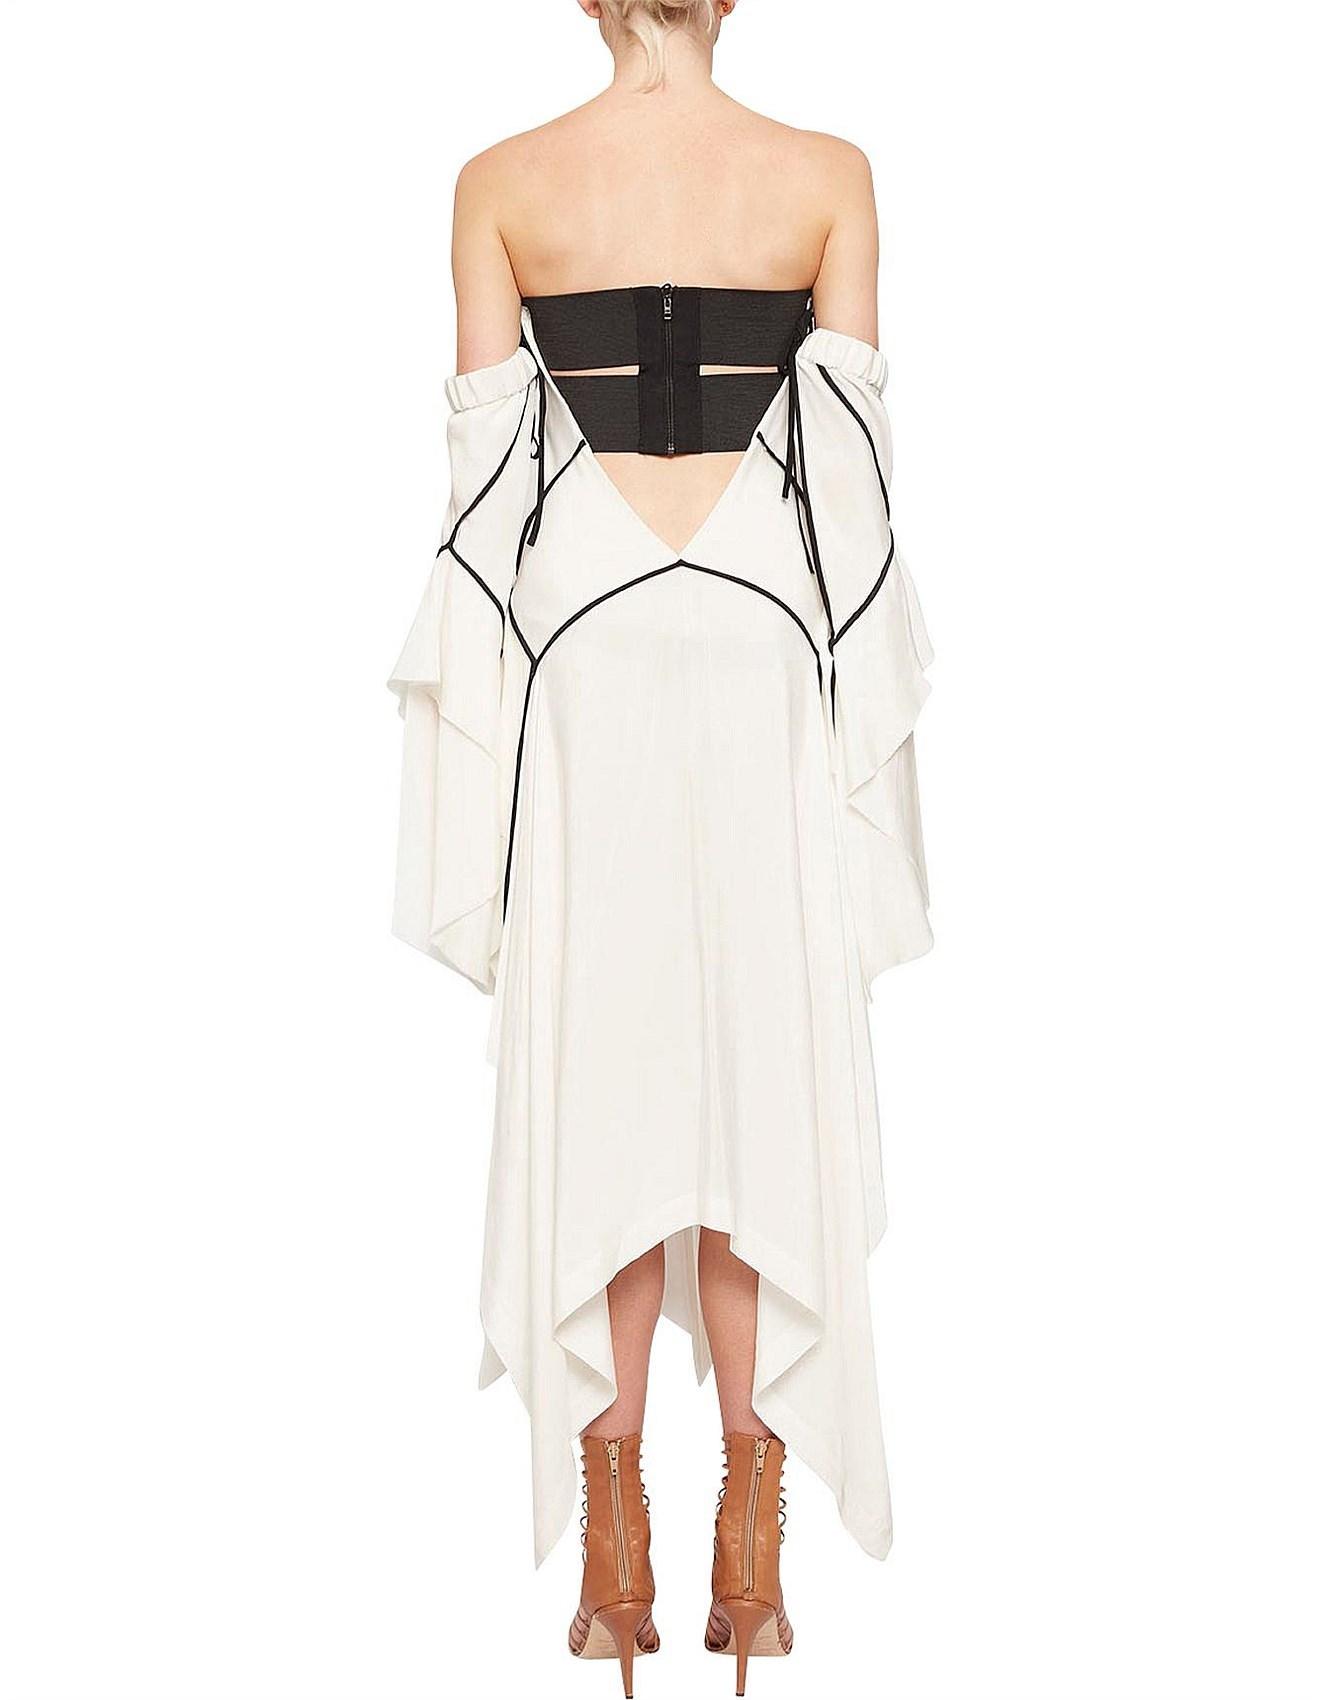 Euphoria Strapless Dress